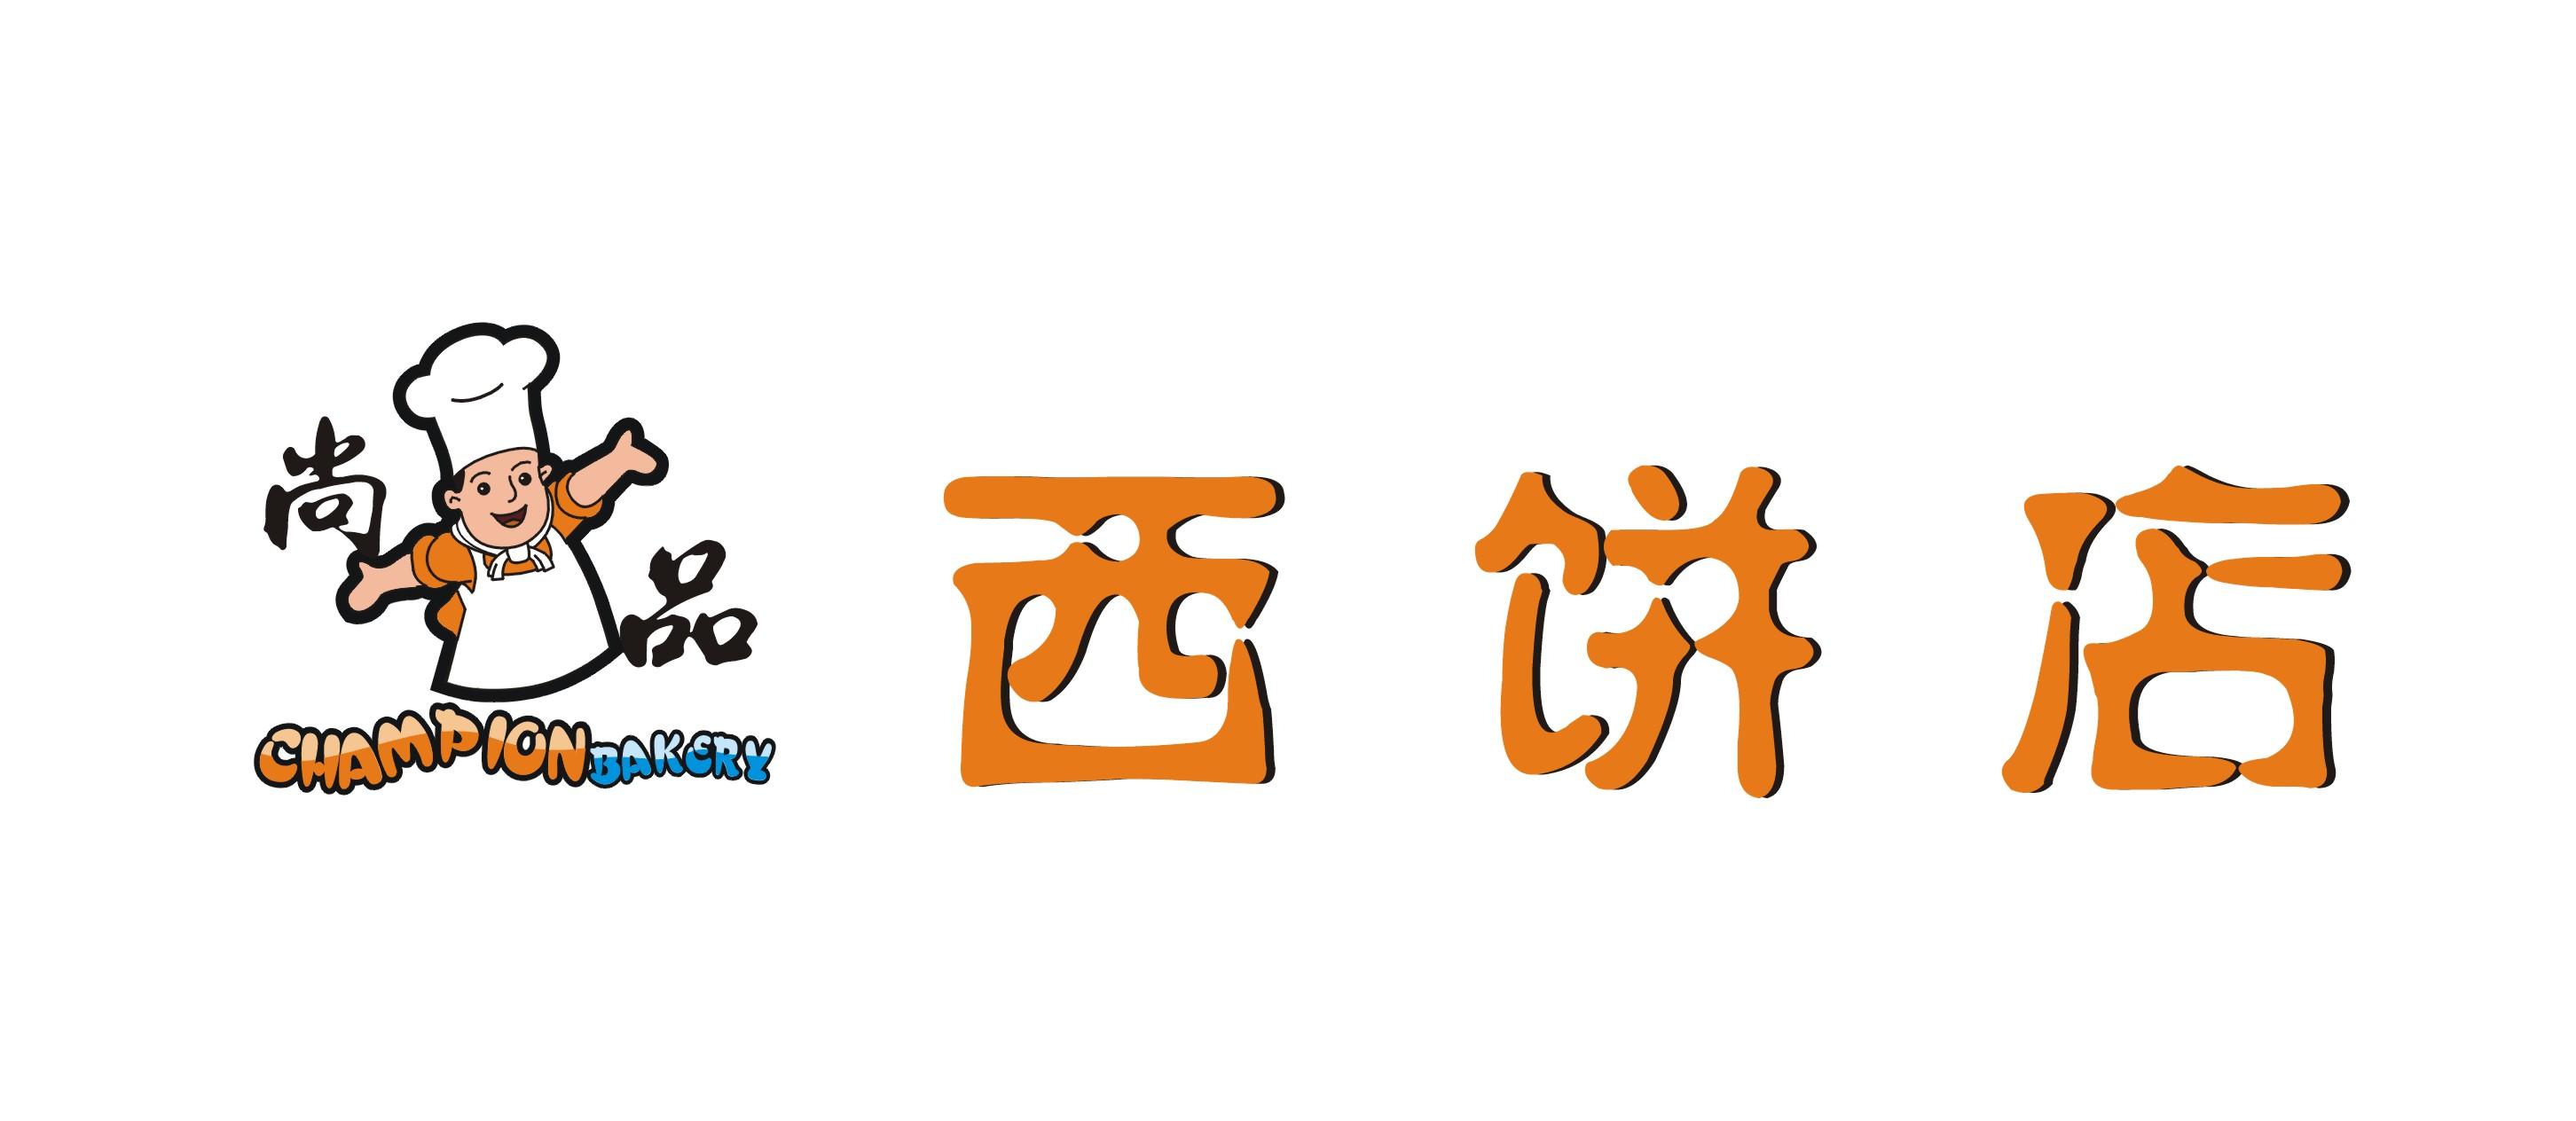 西饼店logo